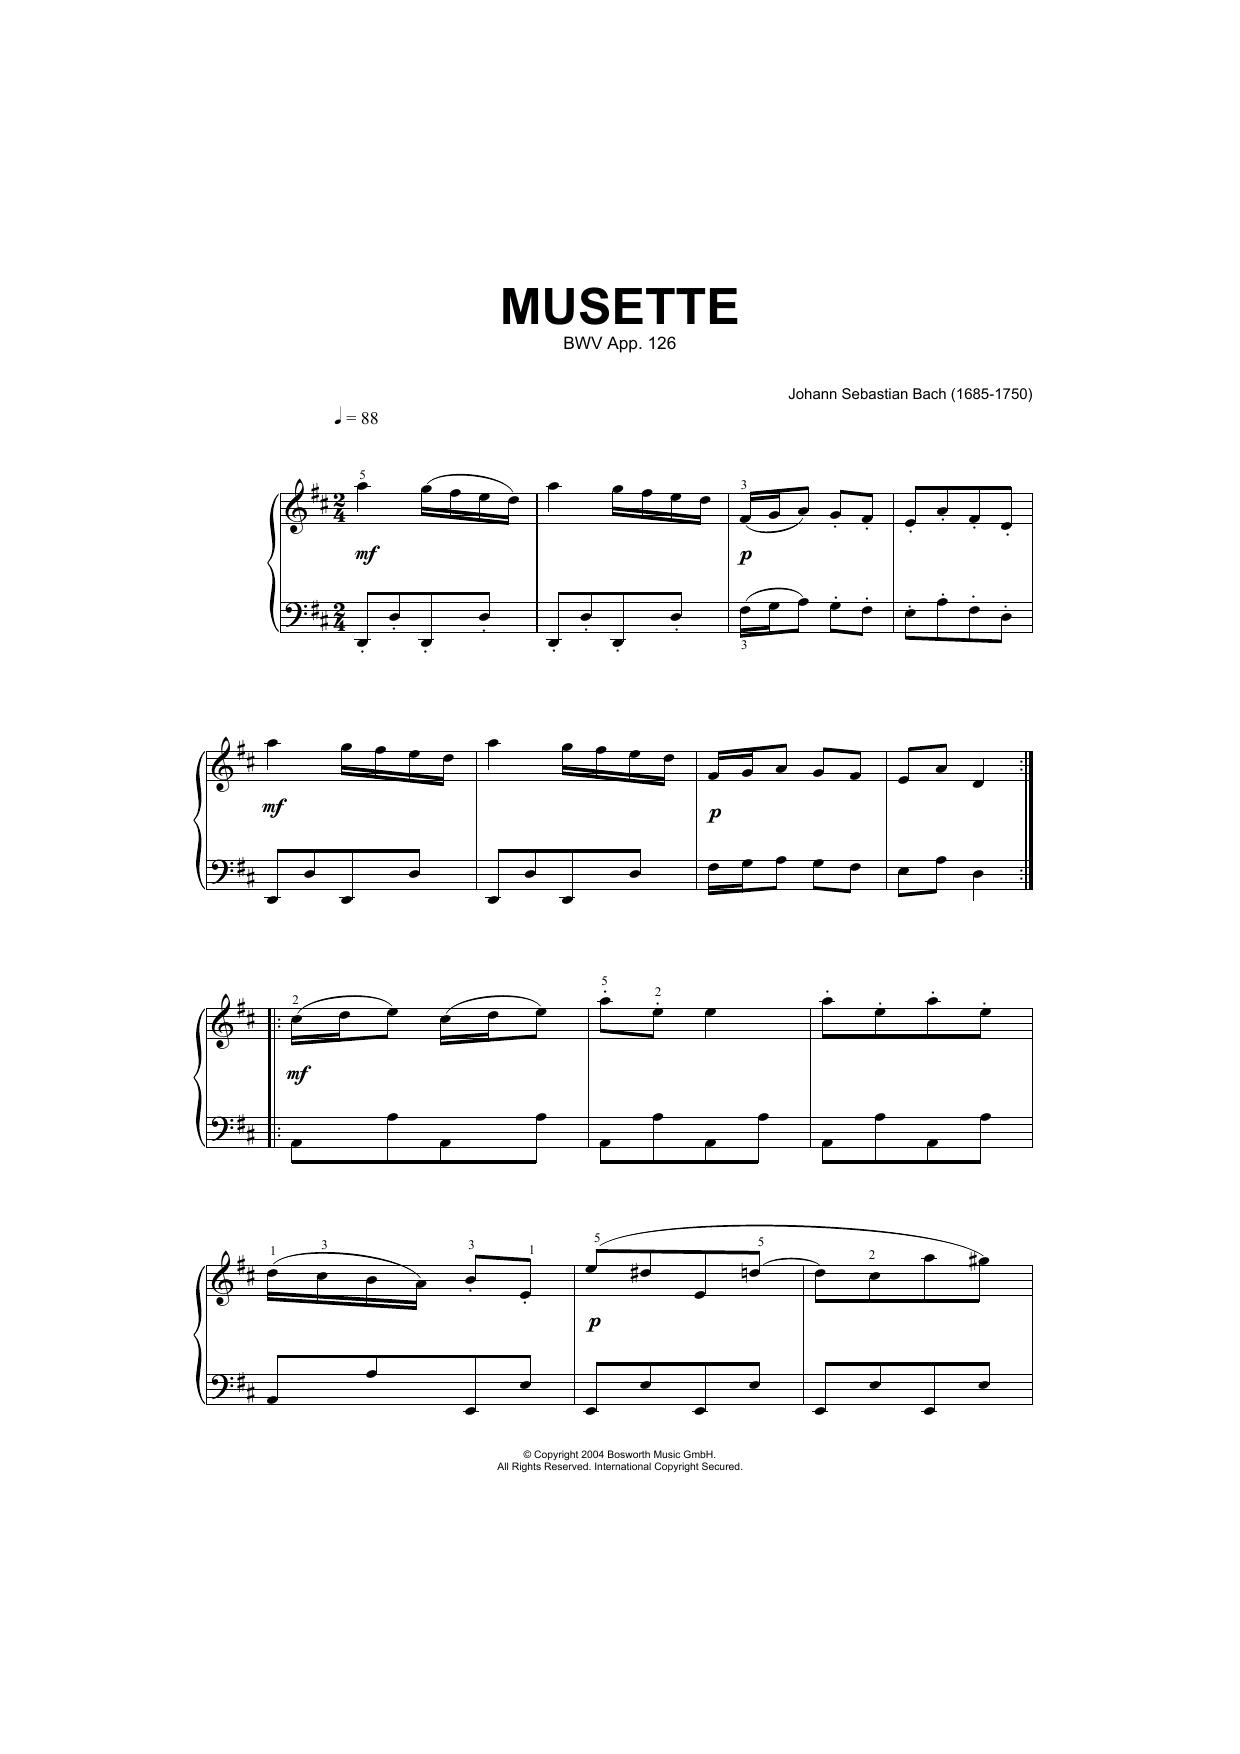 Musette In D Major, BWV App. 126 (Piano Solo)